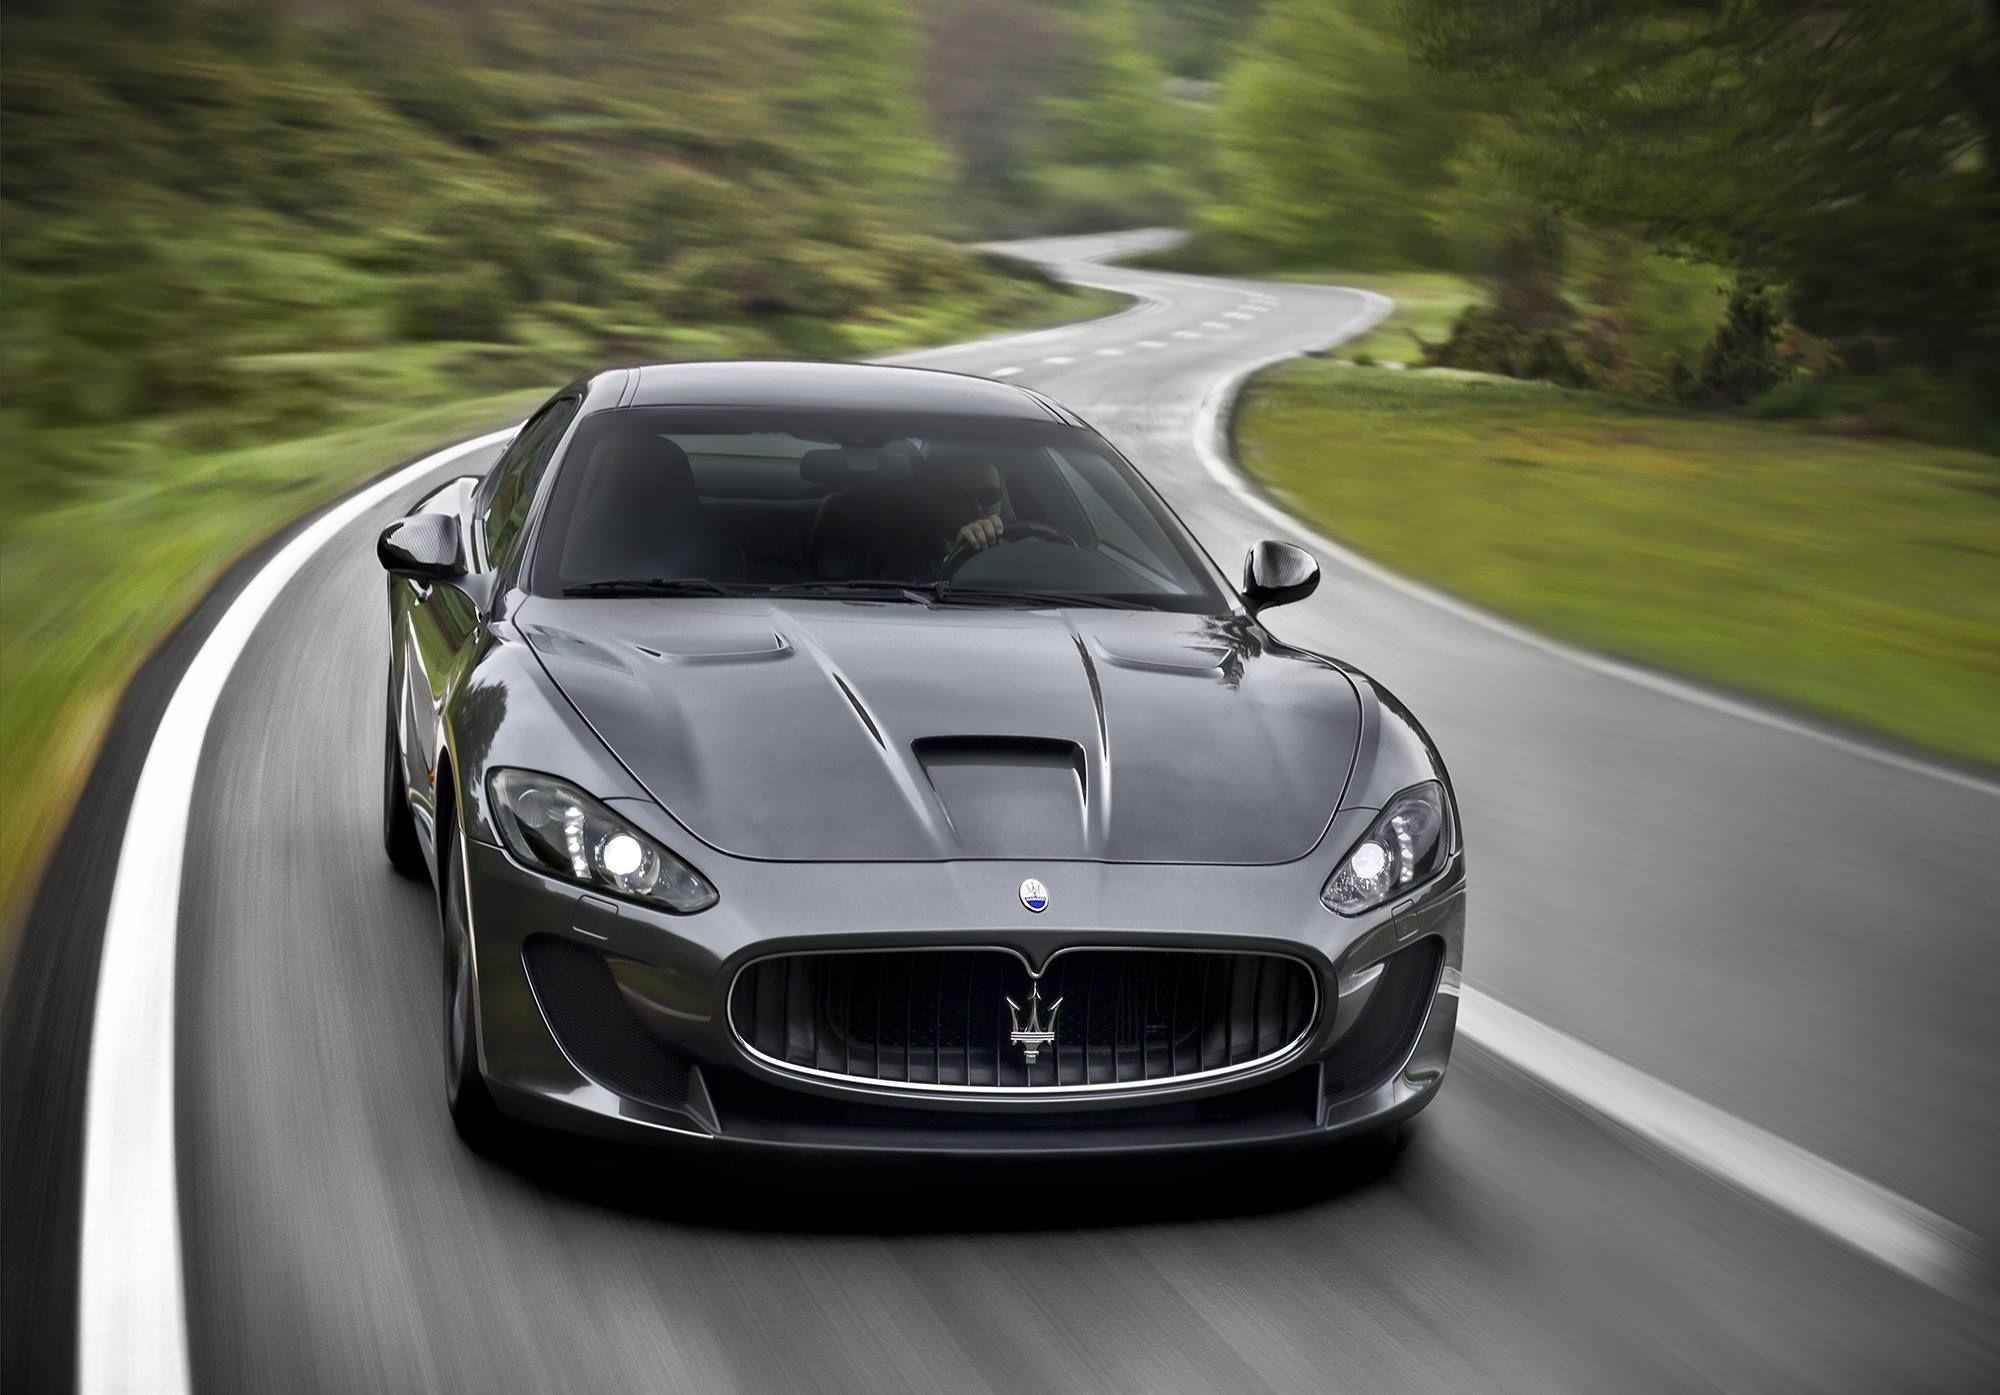 Maserati GranTurismo MC Stradale   automotive ography ...